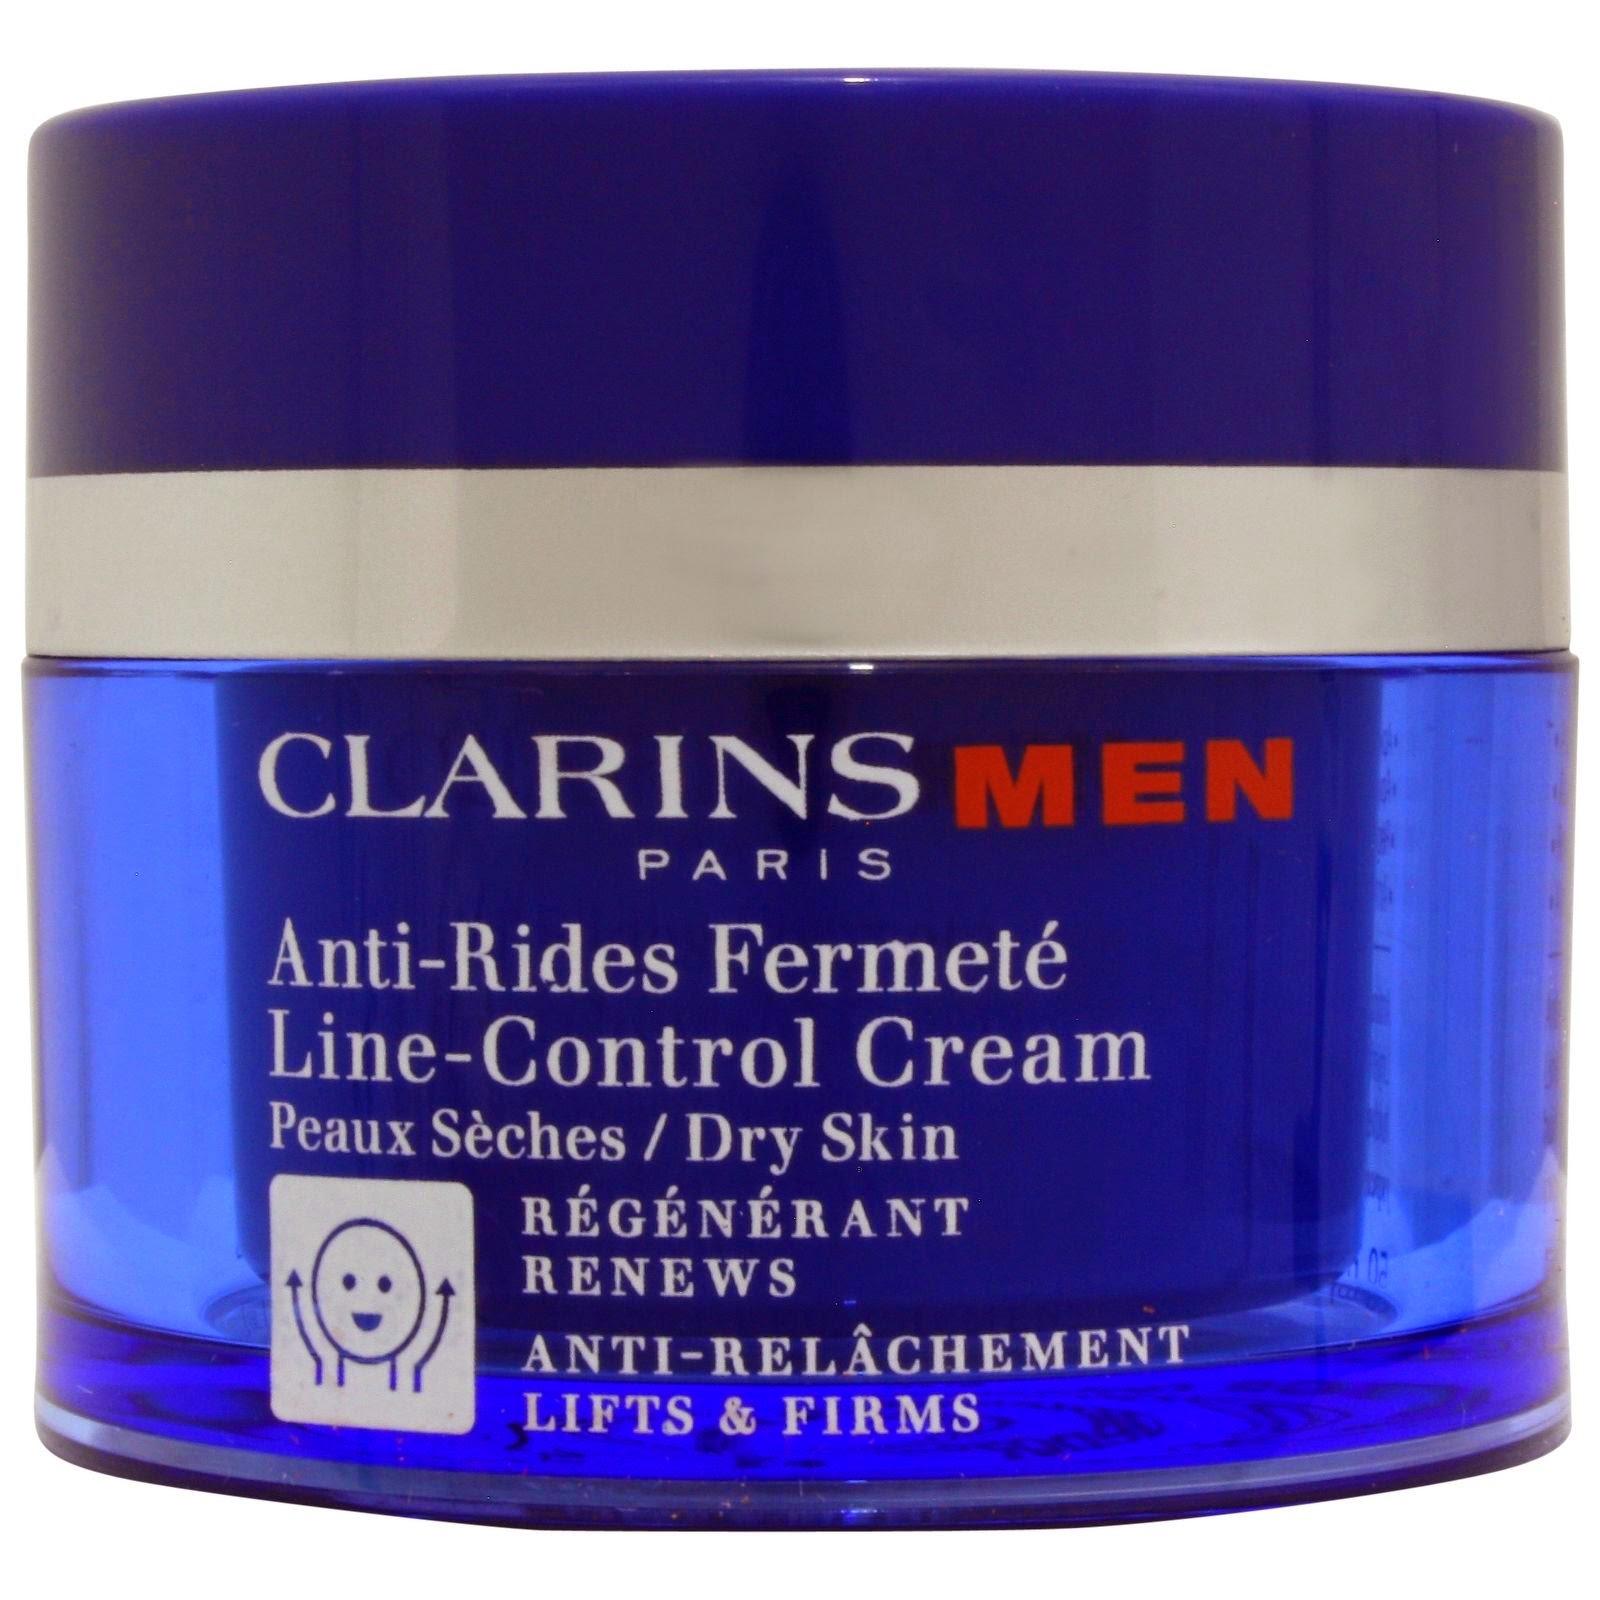 Clarins Men Line-Control Cream -Ανδρική κρέμα αντι-γήρανσης για ξηρά δέρματα.